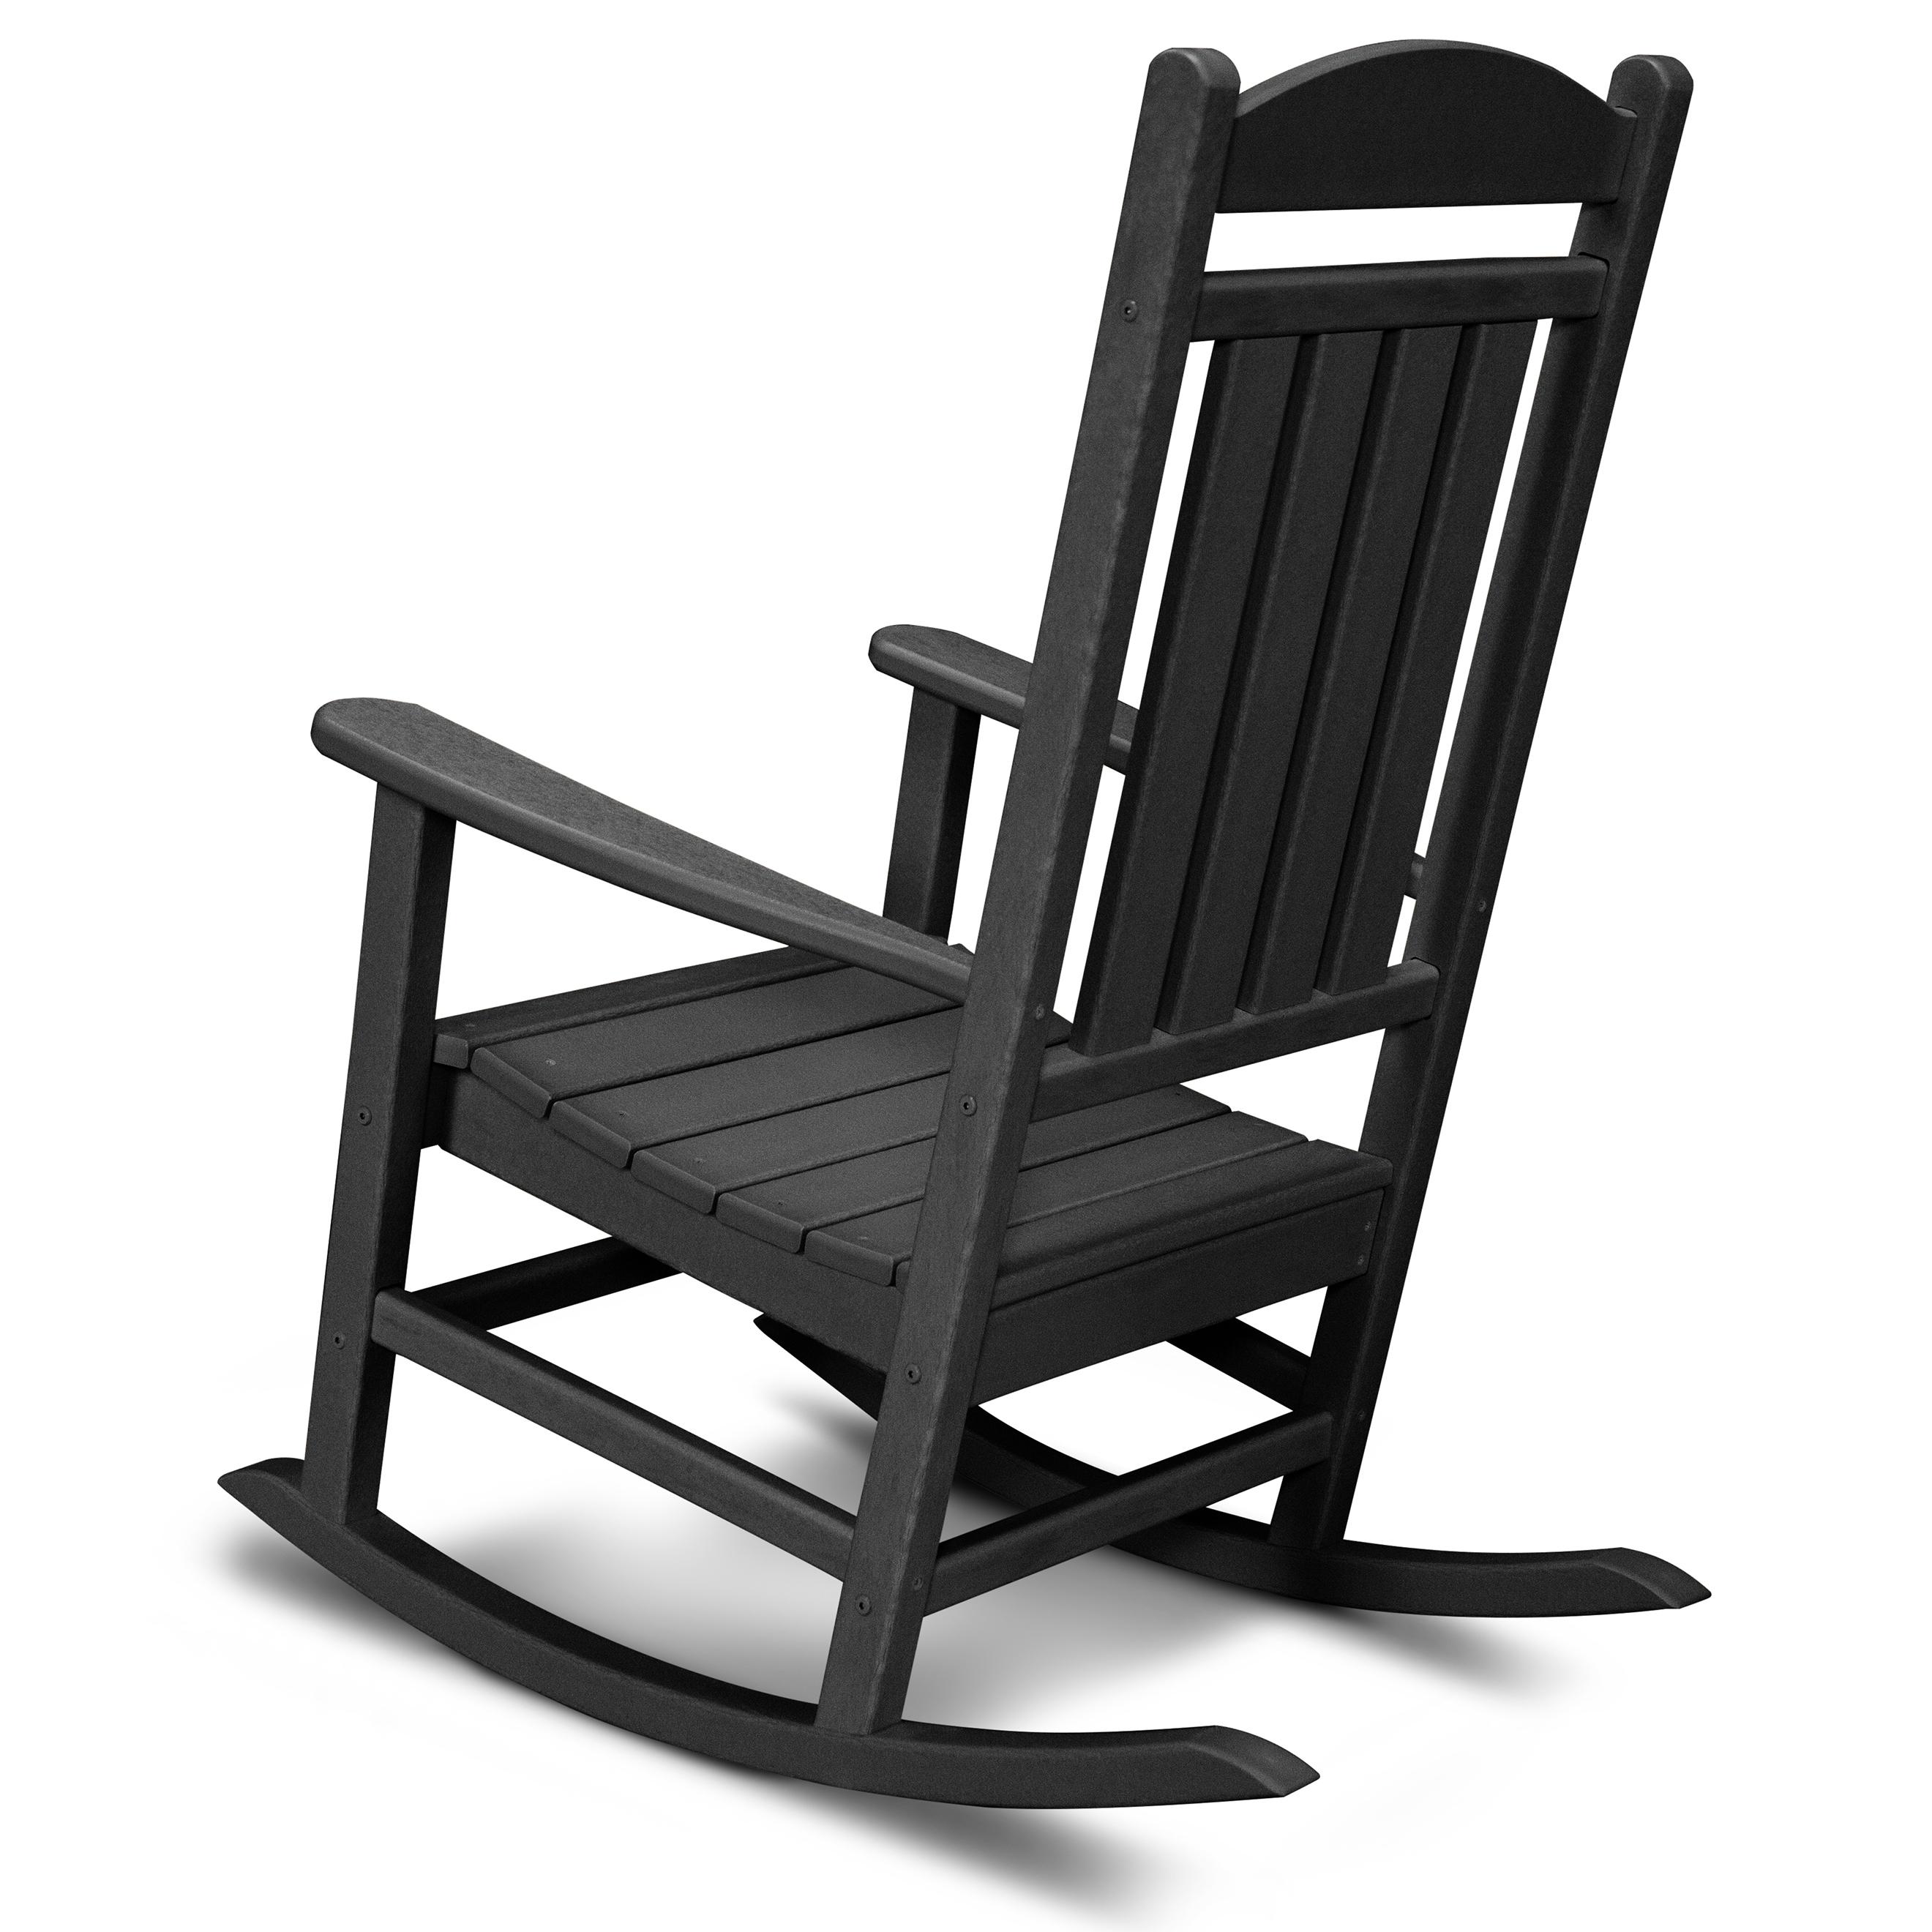 chair cba steel swivel for van beautiful black rocking rtty1